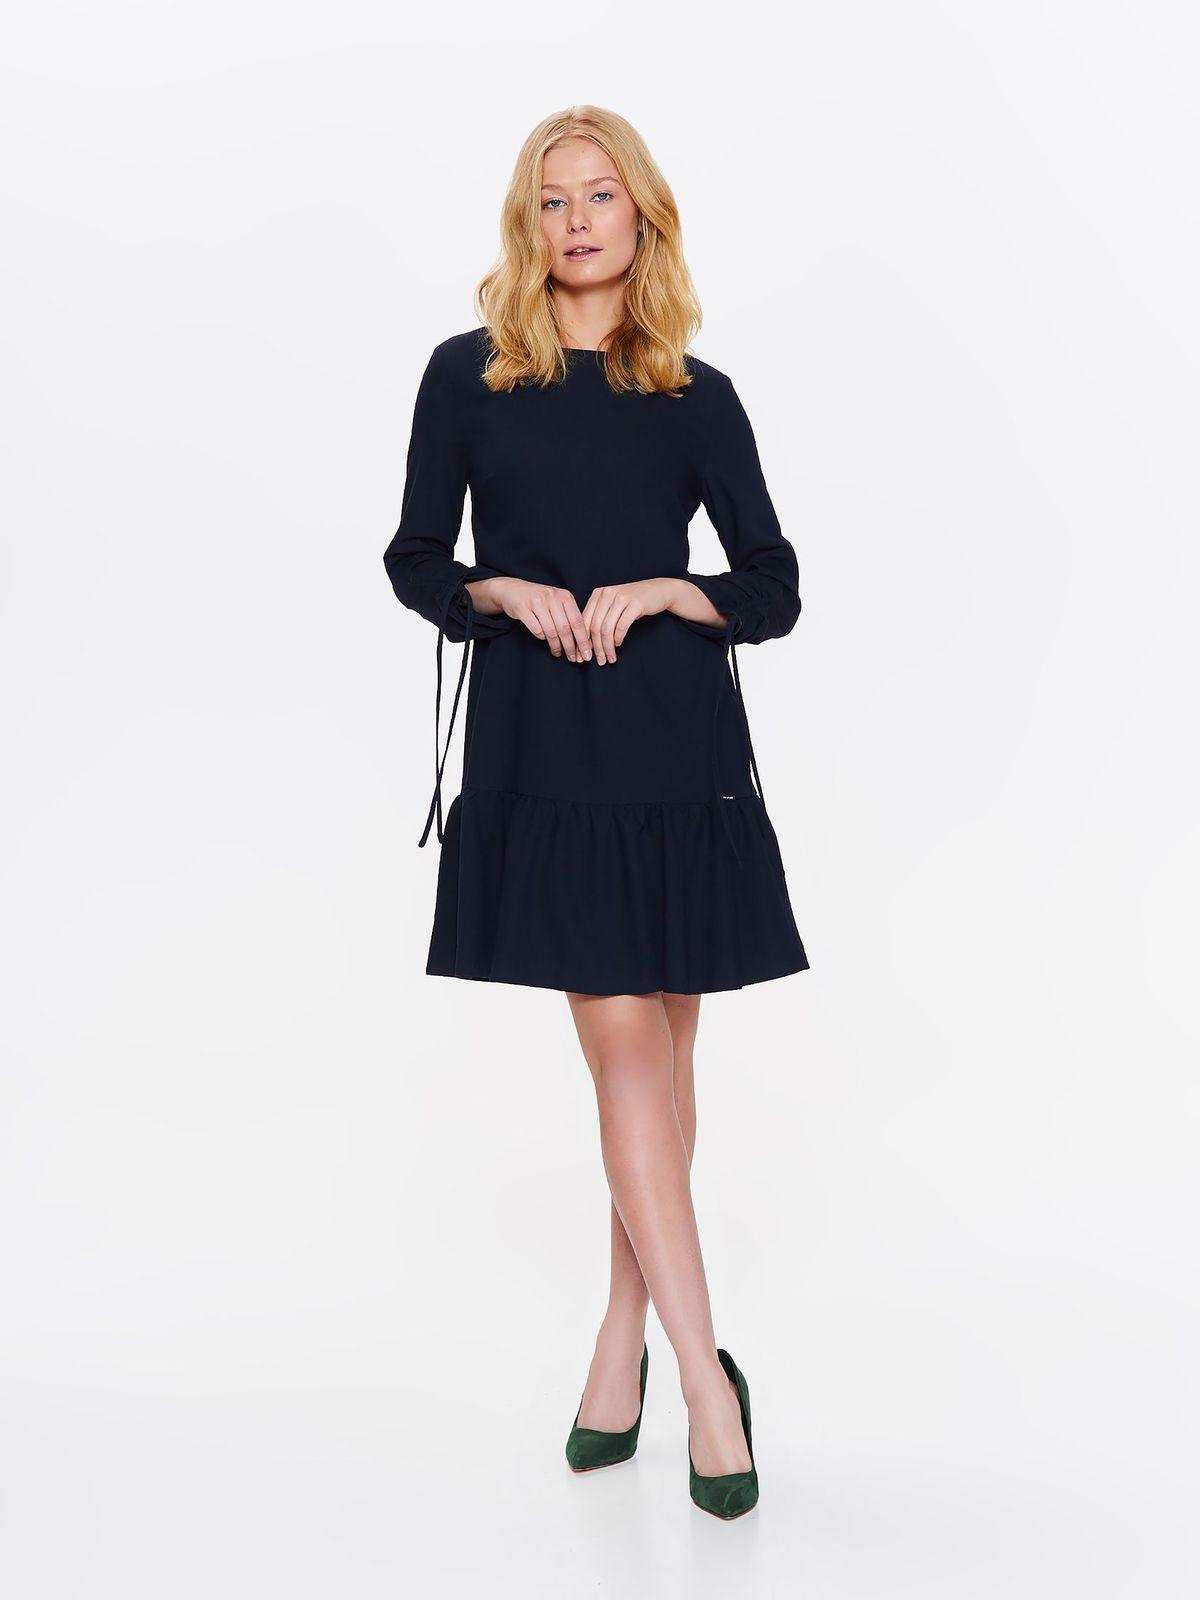 TOP SECRET TOP SECRET loose φορεμα